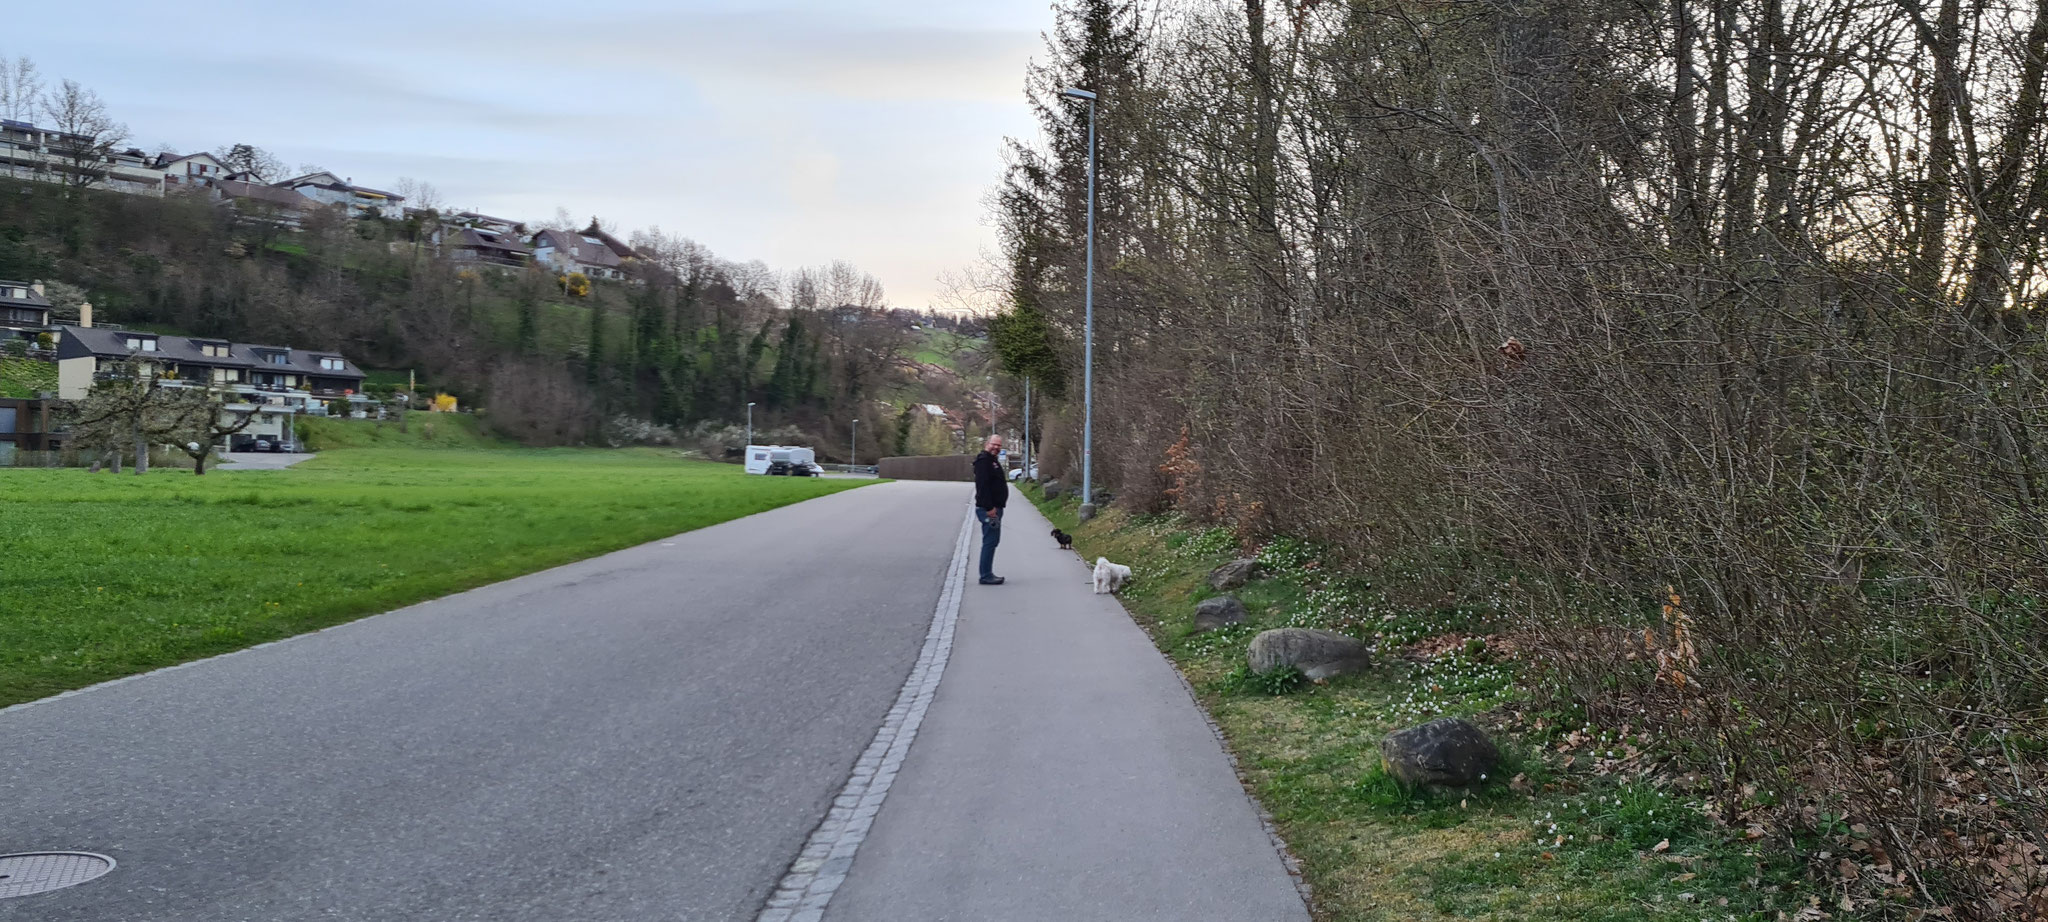 Morgenspaziergang in Steffisburg